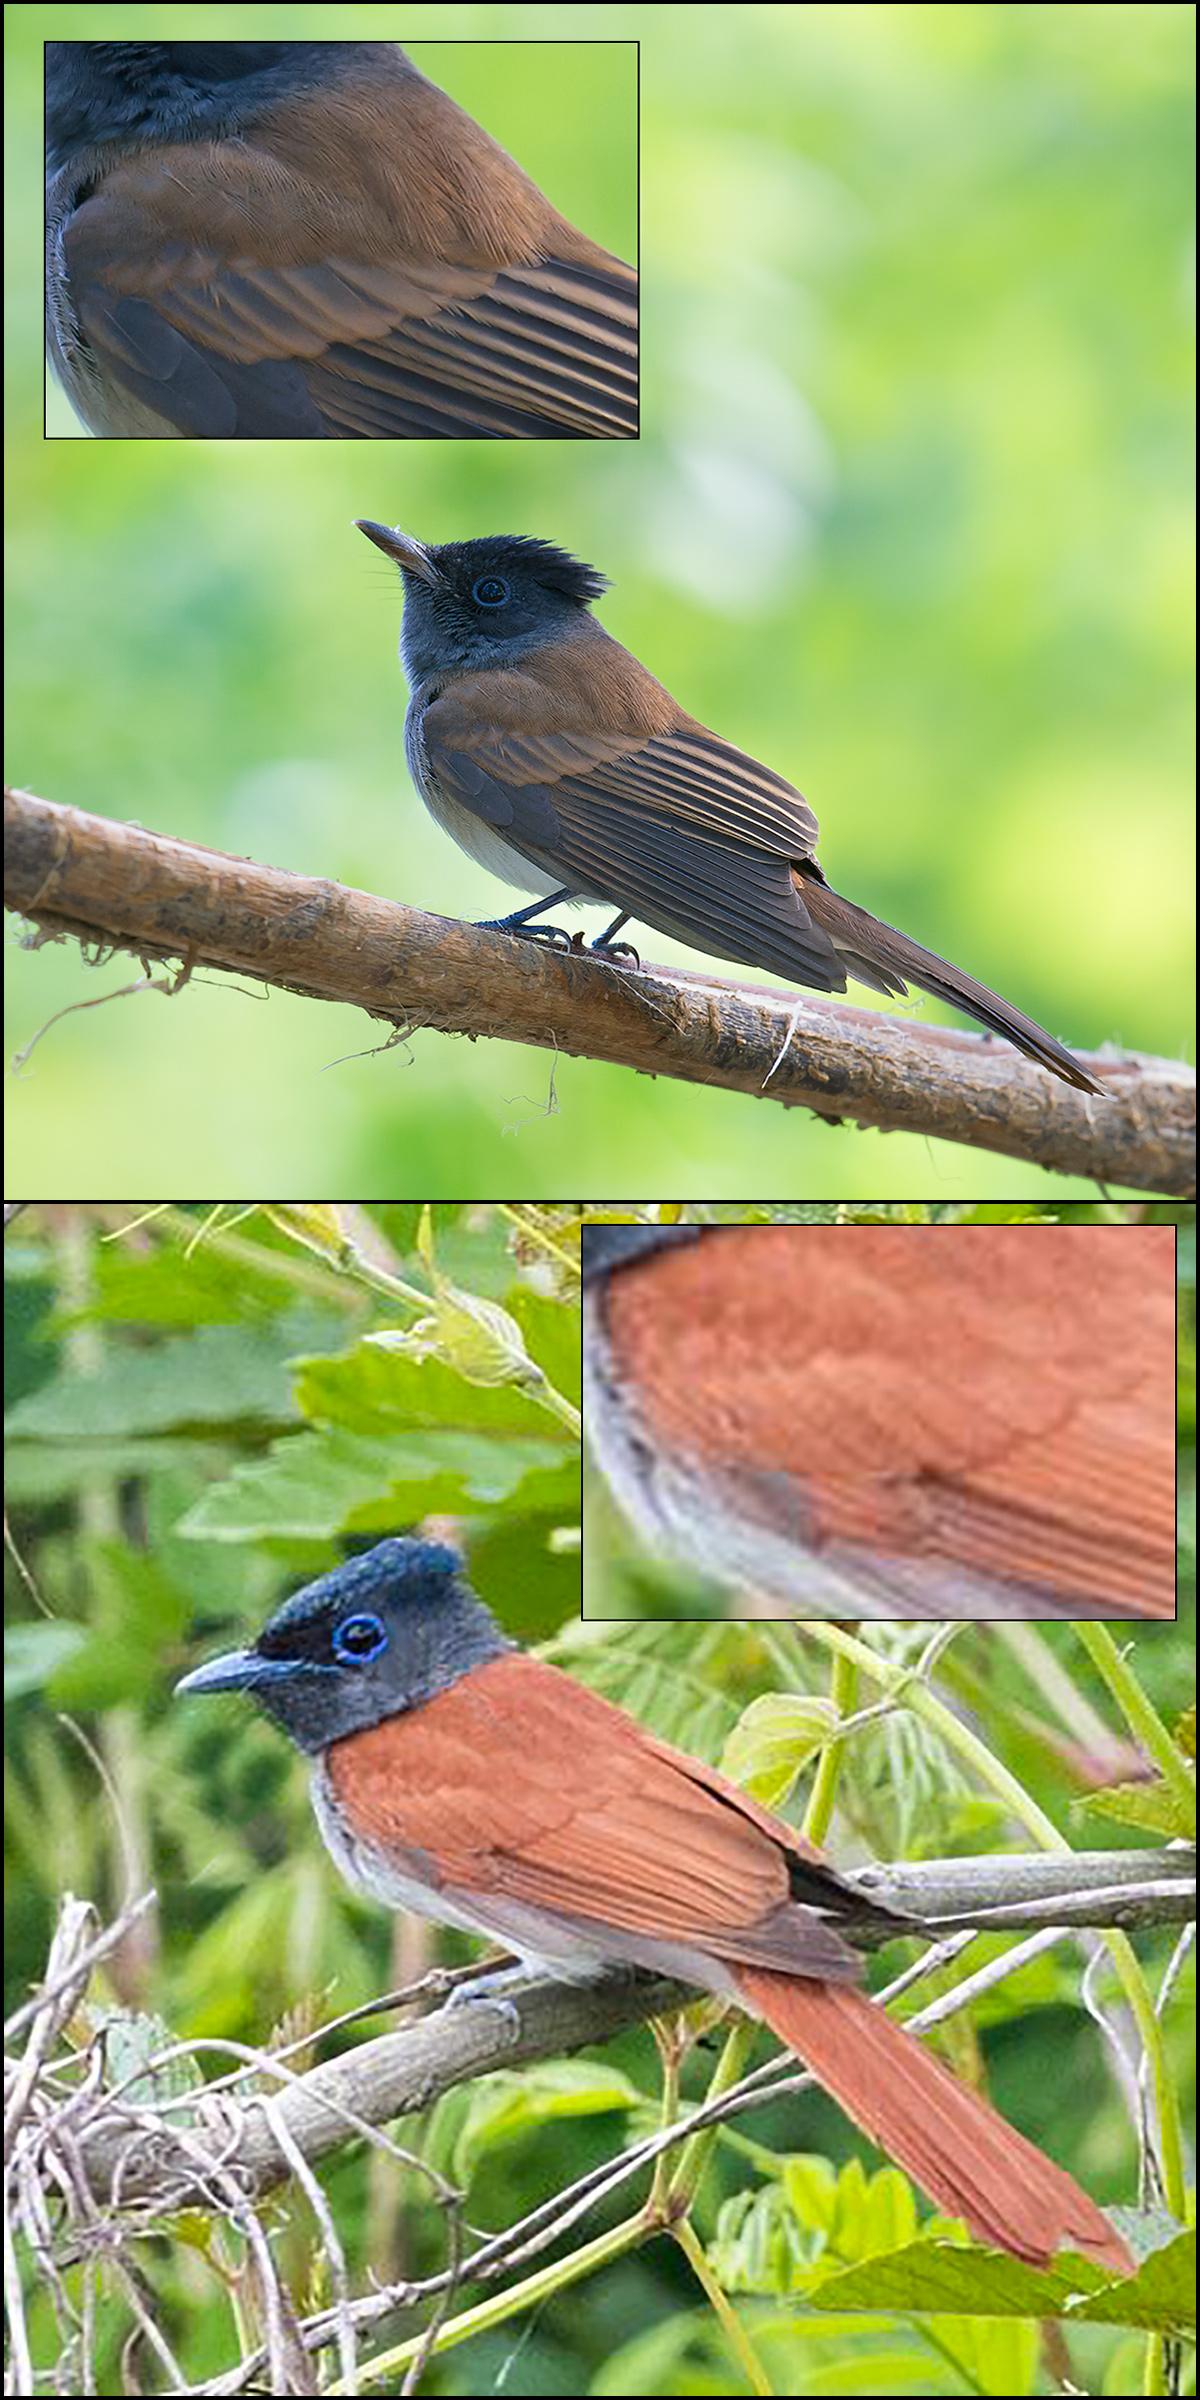 Top: Japanese Paradise Flycatcher (Craig Brelsford). Bottom: Amur Paradise Flycatcher (Kai Pflug).